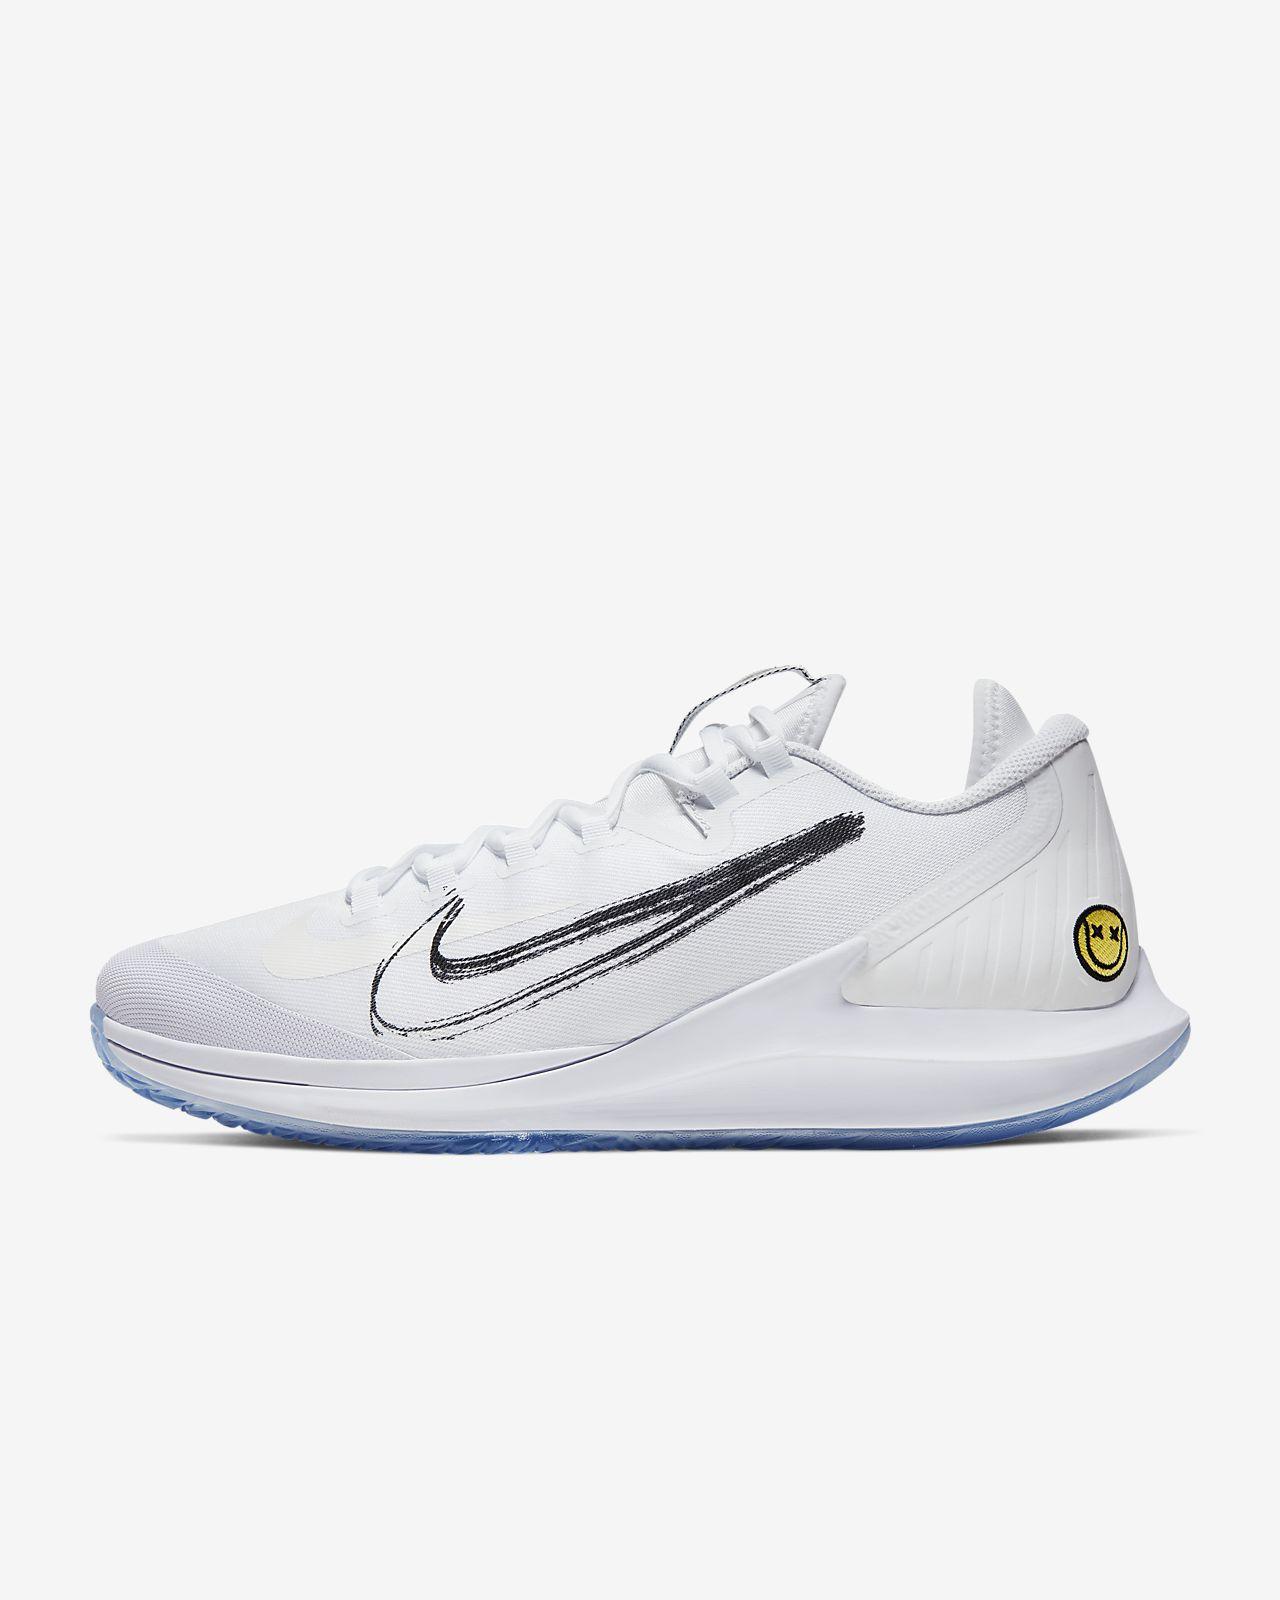 a31bb4b5defc Chaussure de tennis NikeCourt Air Zoom Zero pour Homme. Nike.com CA